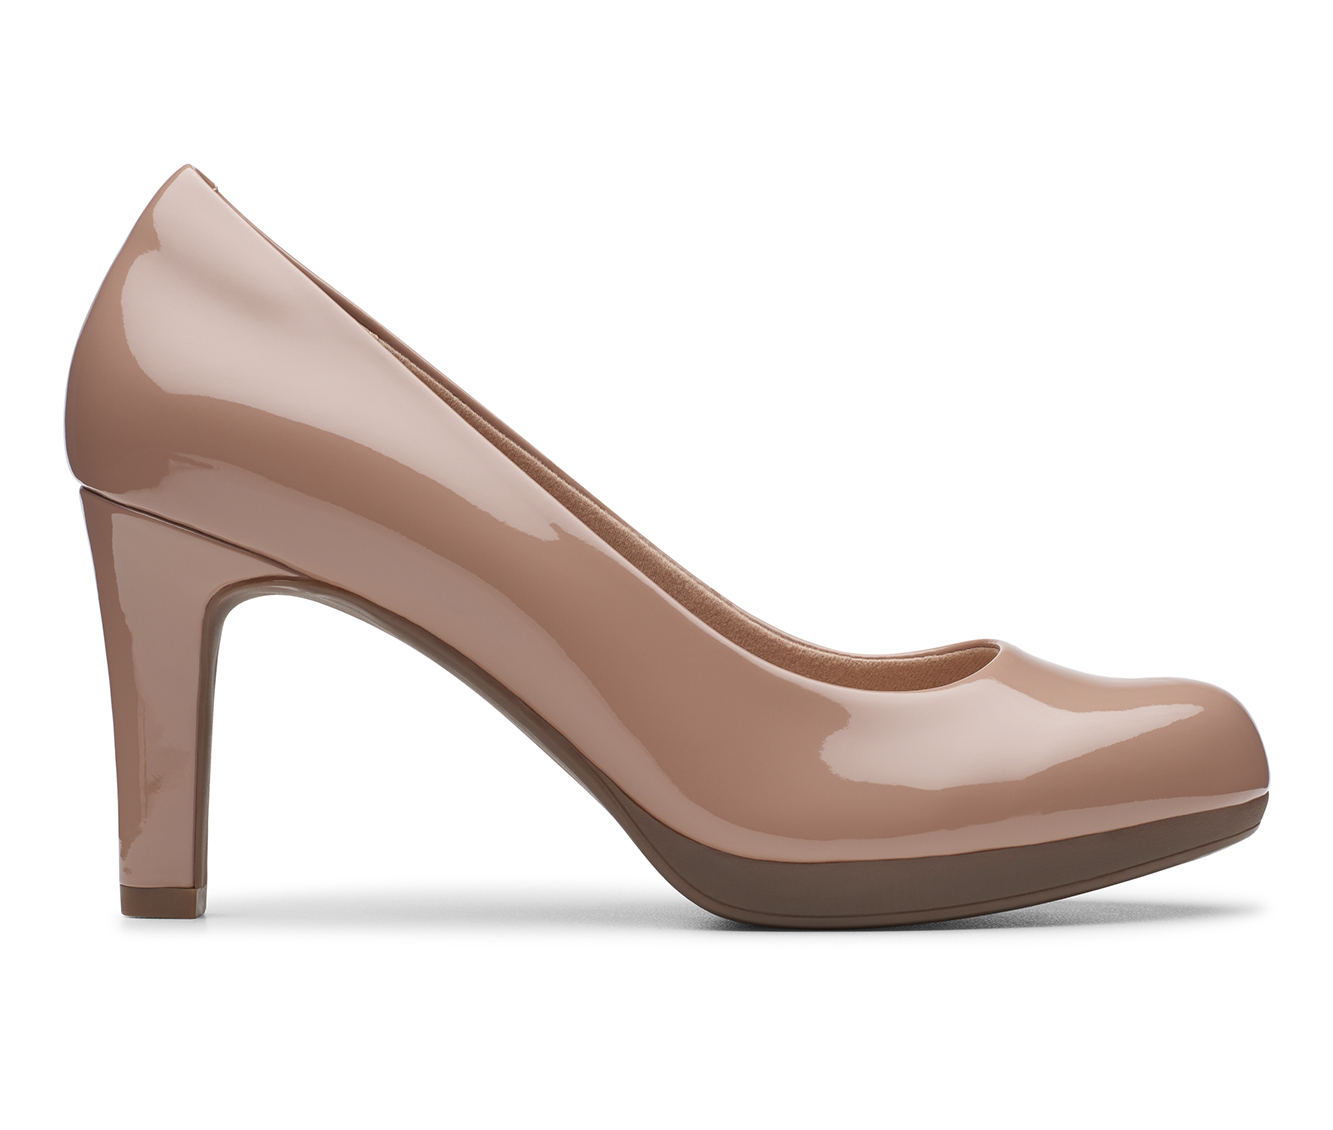 Clarks Adriel Viola Women's Dress Shoe (Brown Faux Leather)